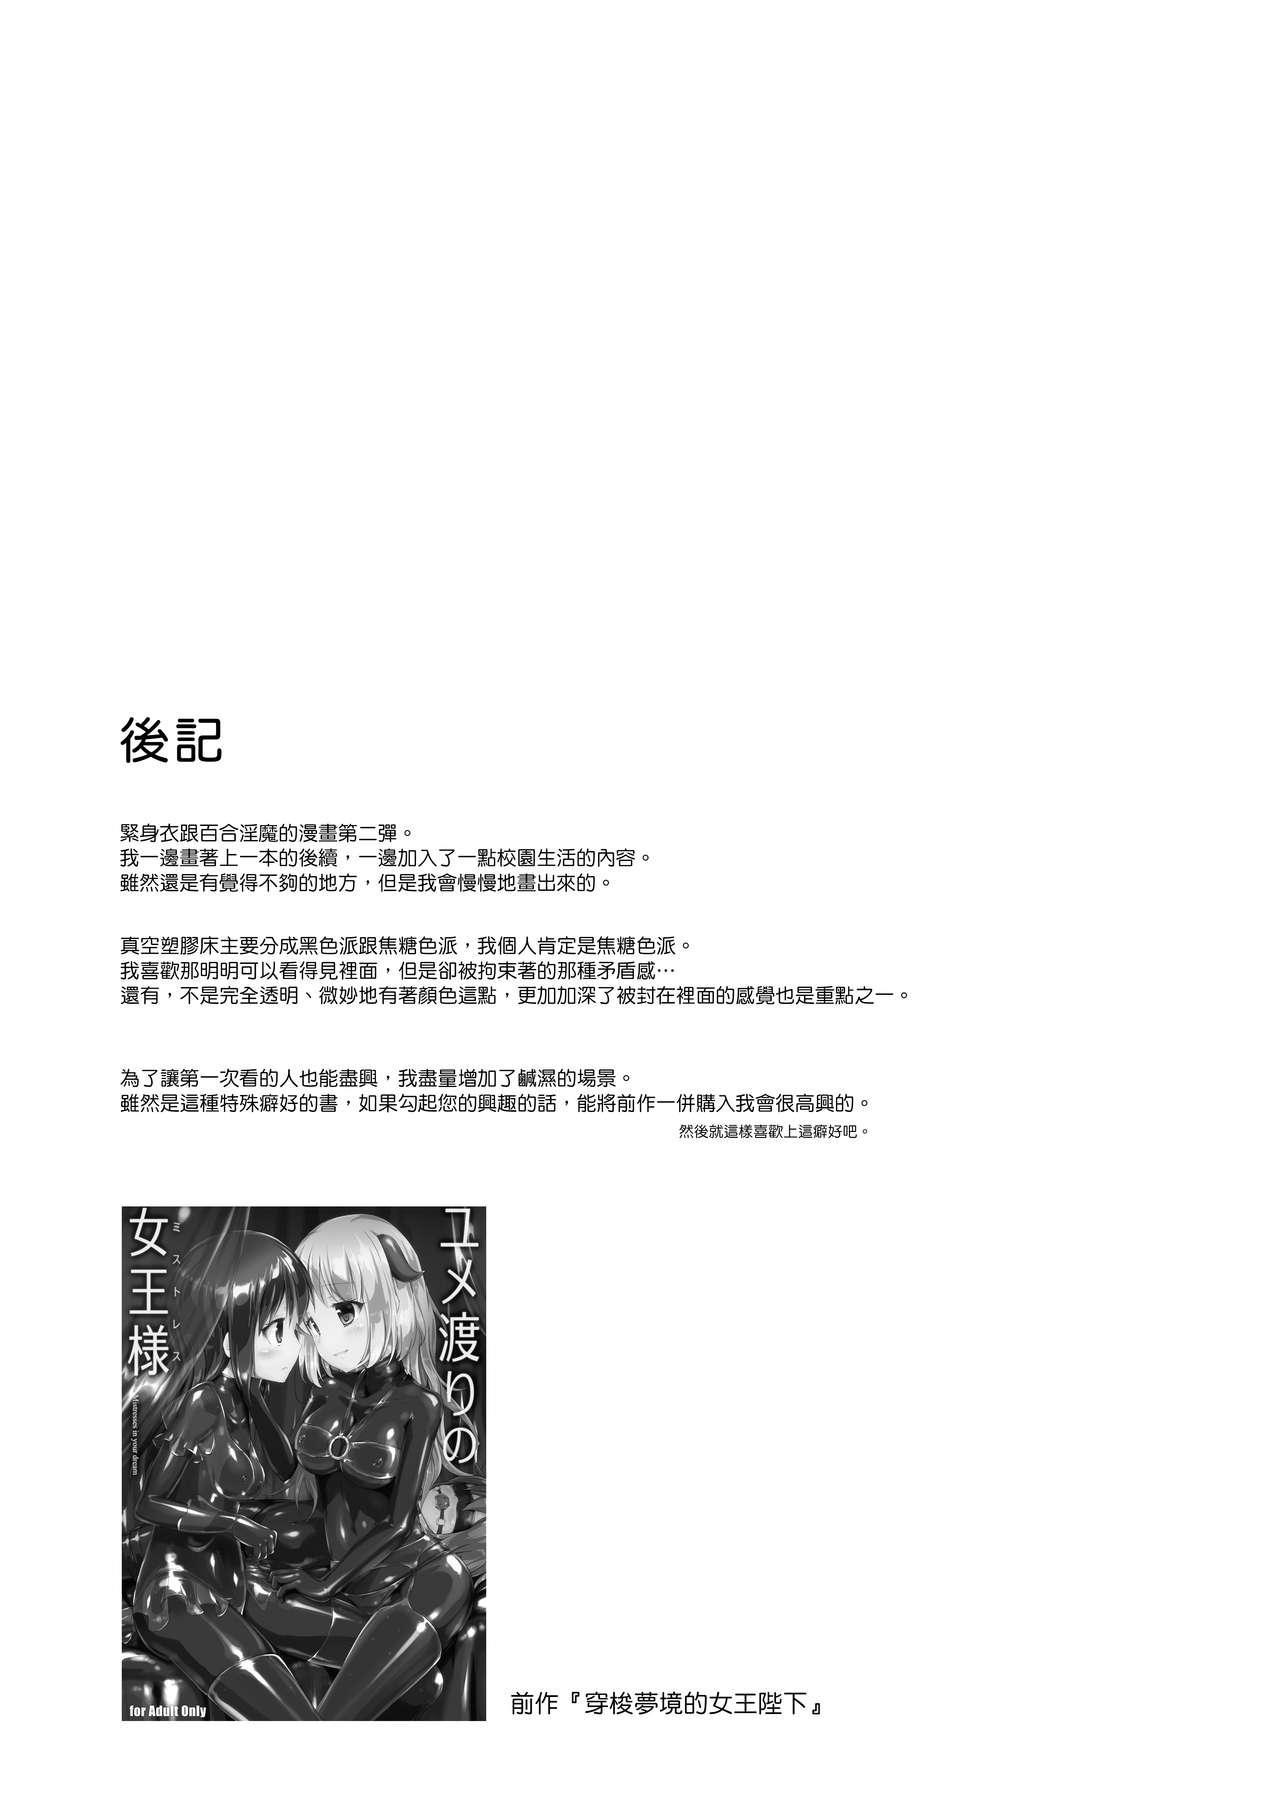 Yumewatari no Mistress Night 2 | 穿梭夢境的女王陛下 night 2 37